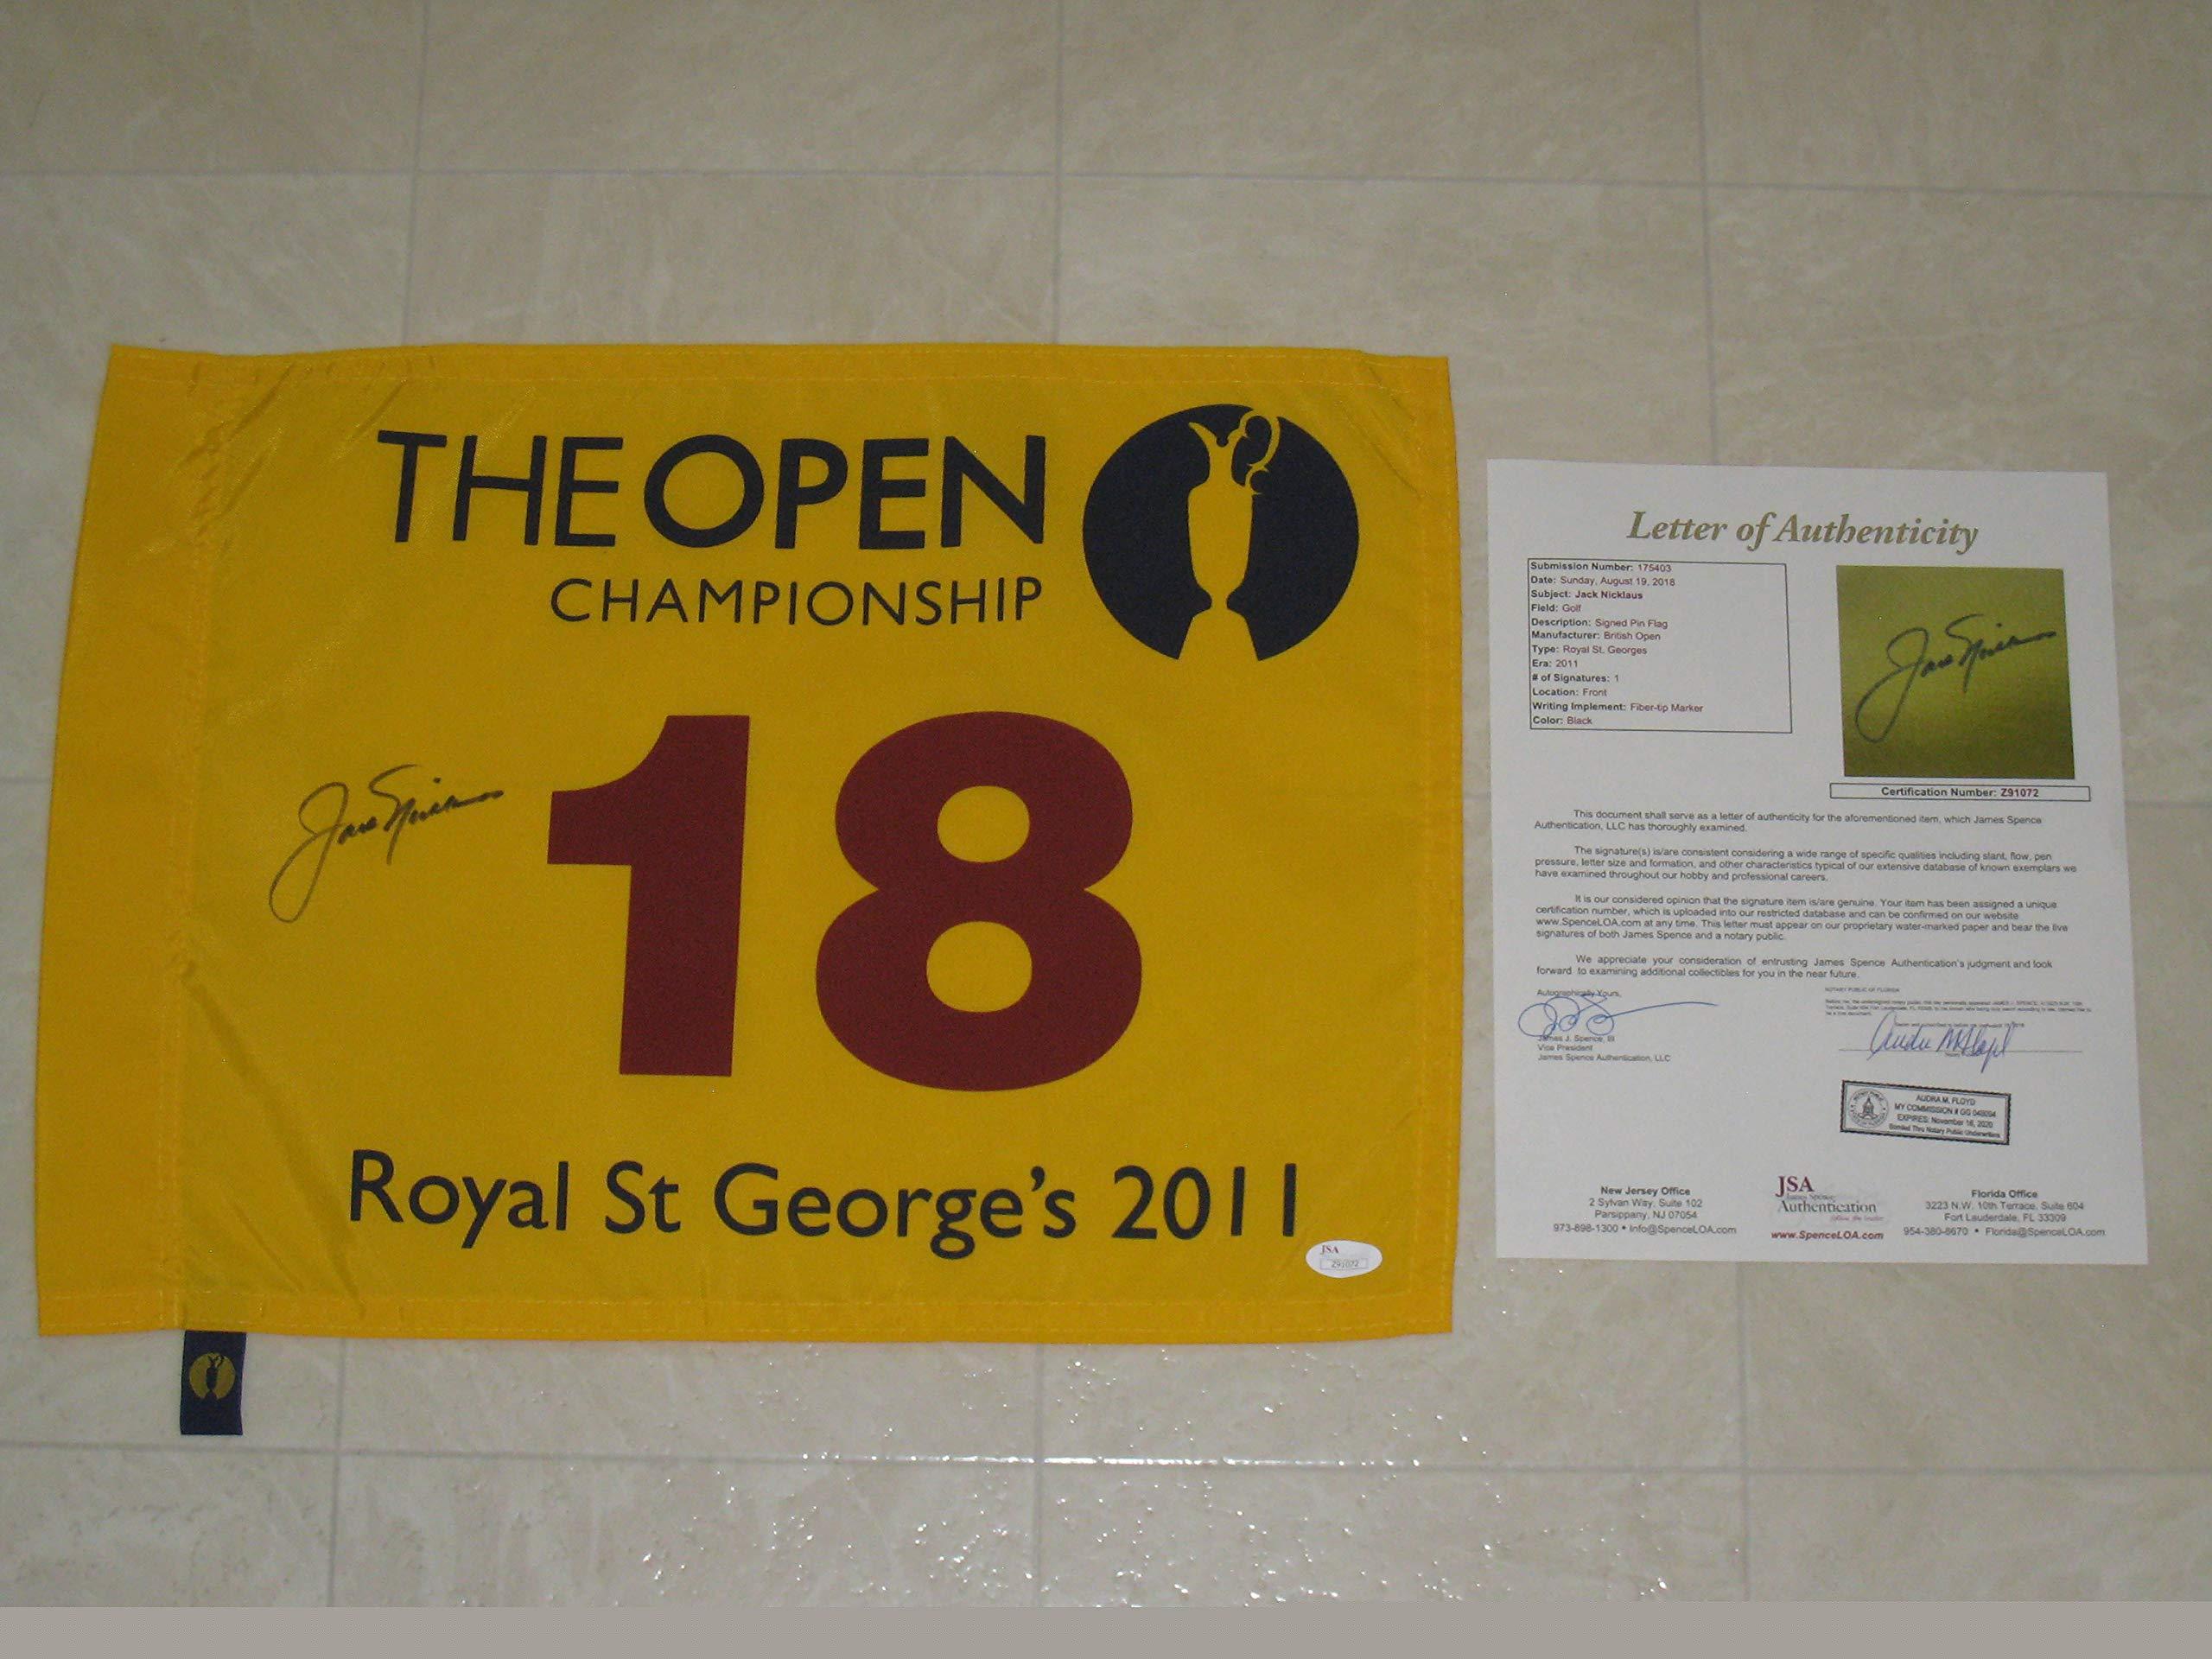 Jack Nicklaus Autographed 2011 British Open Royal St. George's The Open Tournament Flag (JSA COA)